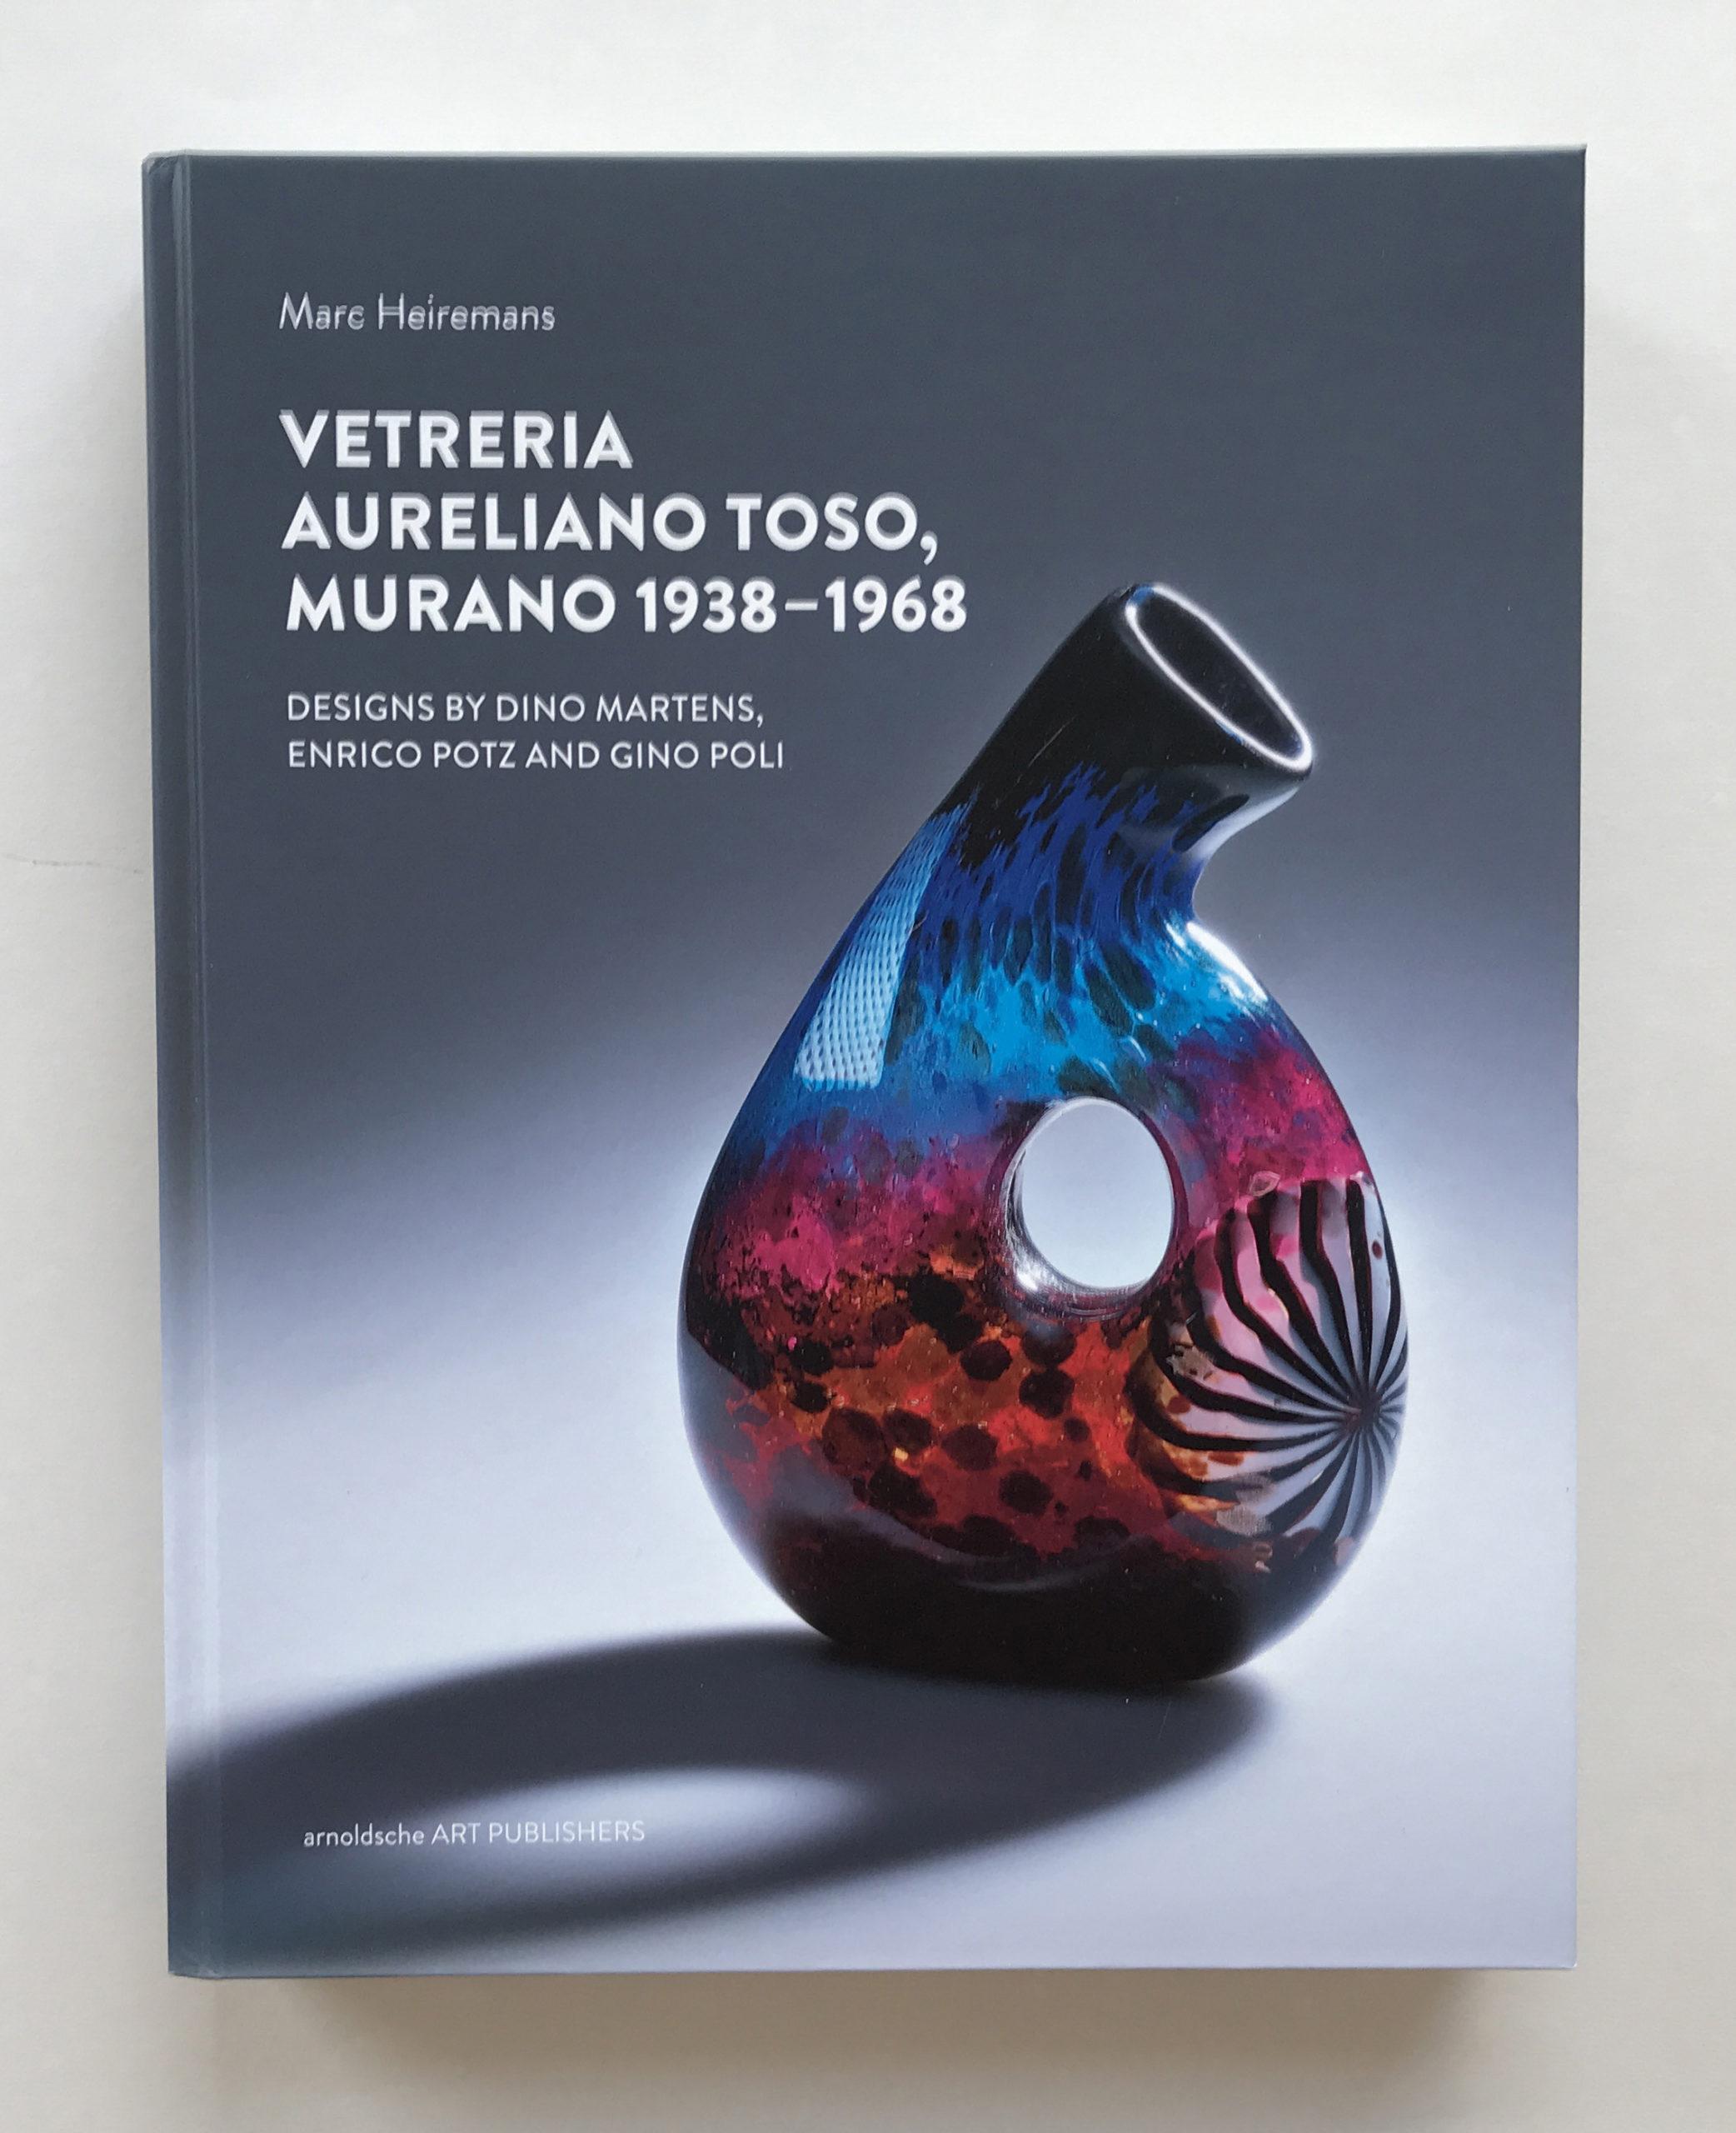 Arnoldsche Art Publishers | Vetreria – Aureliano Toso, Murano 1938–1968